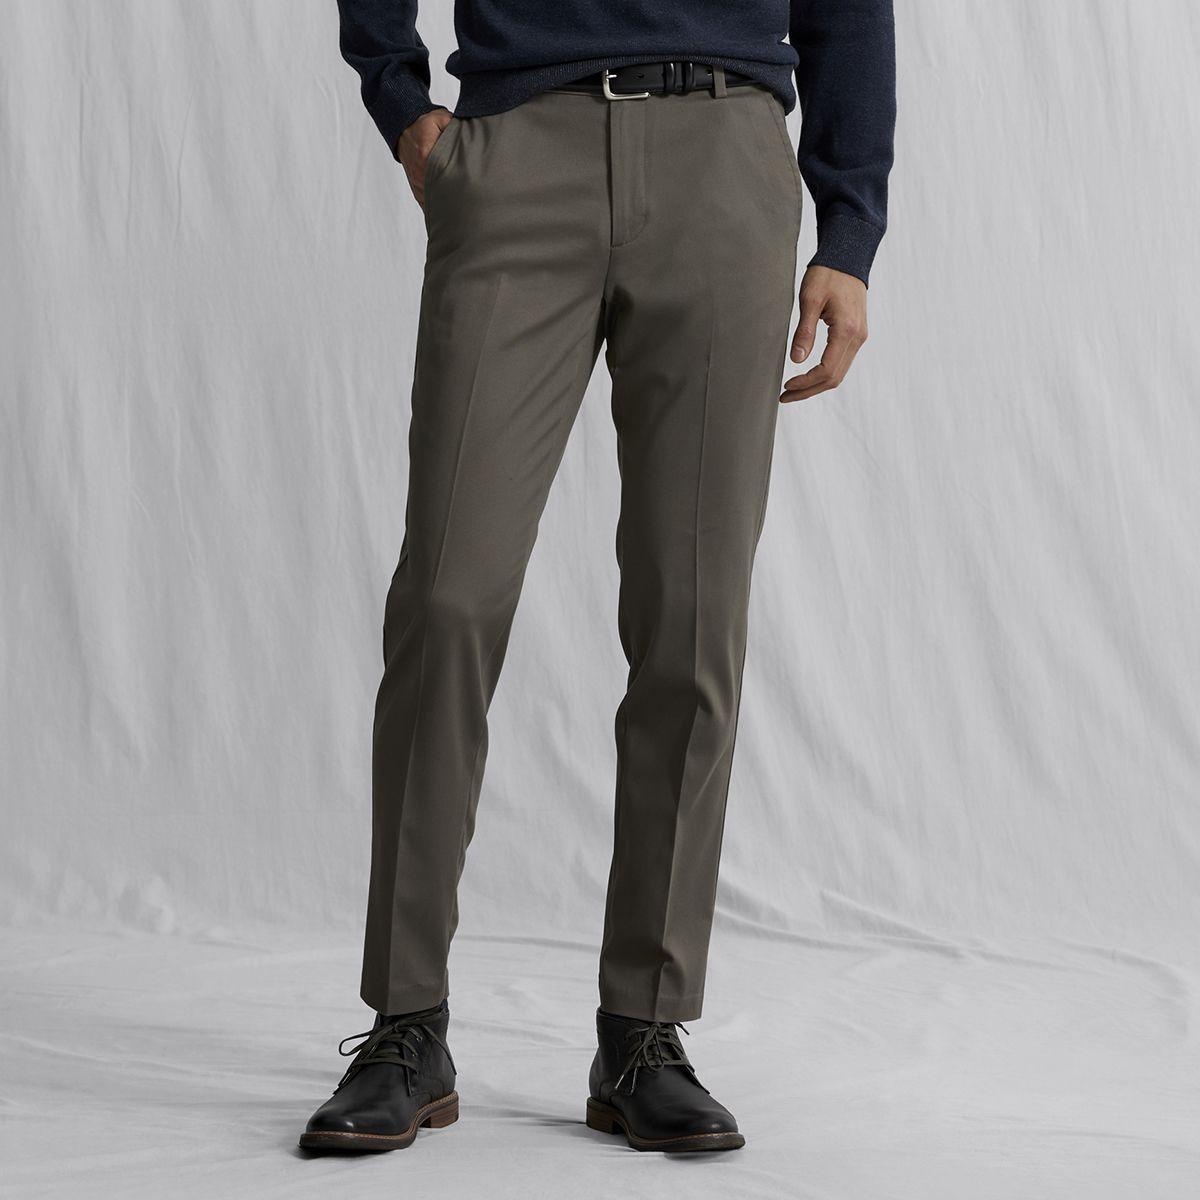 aa57d0a4b48 Dockers - Men's Dockers Pants, Khakis & Clothing - Macy's